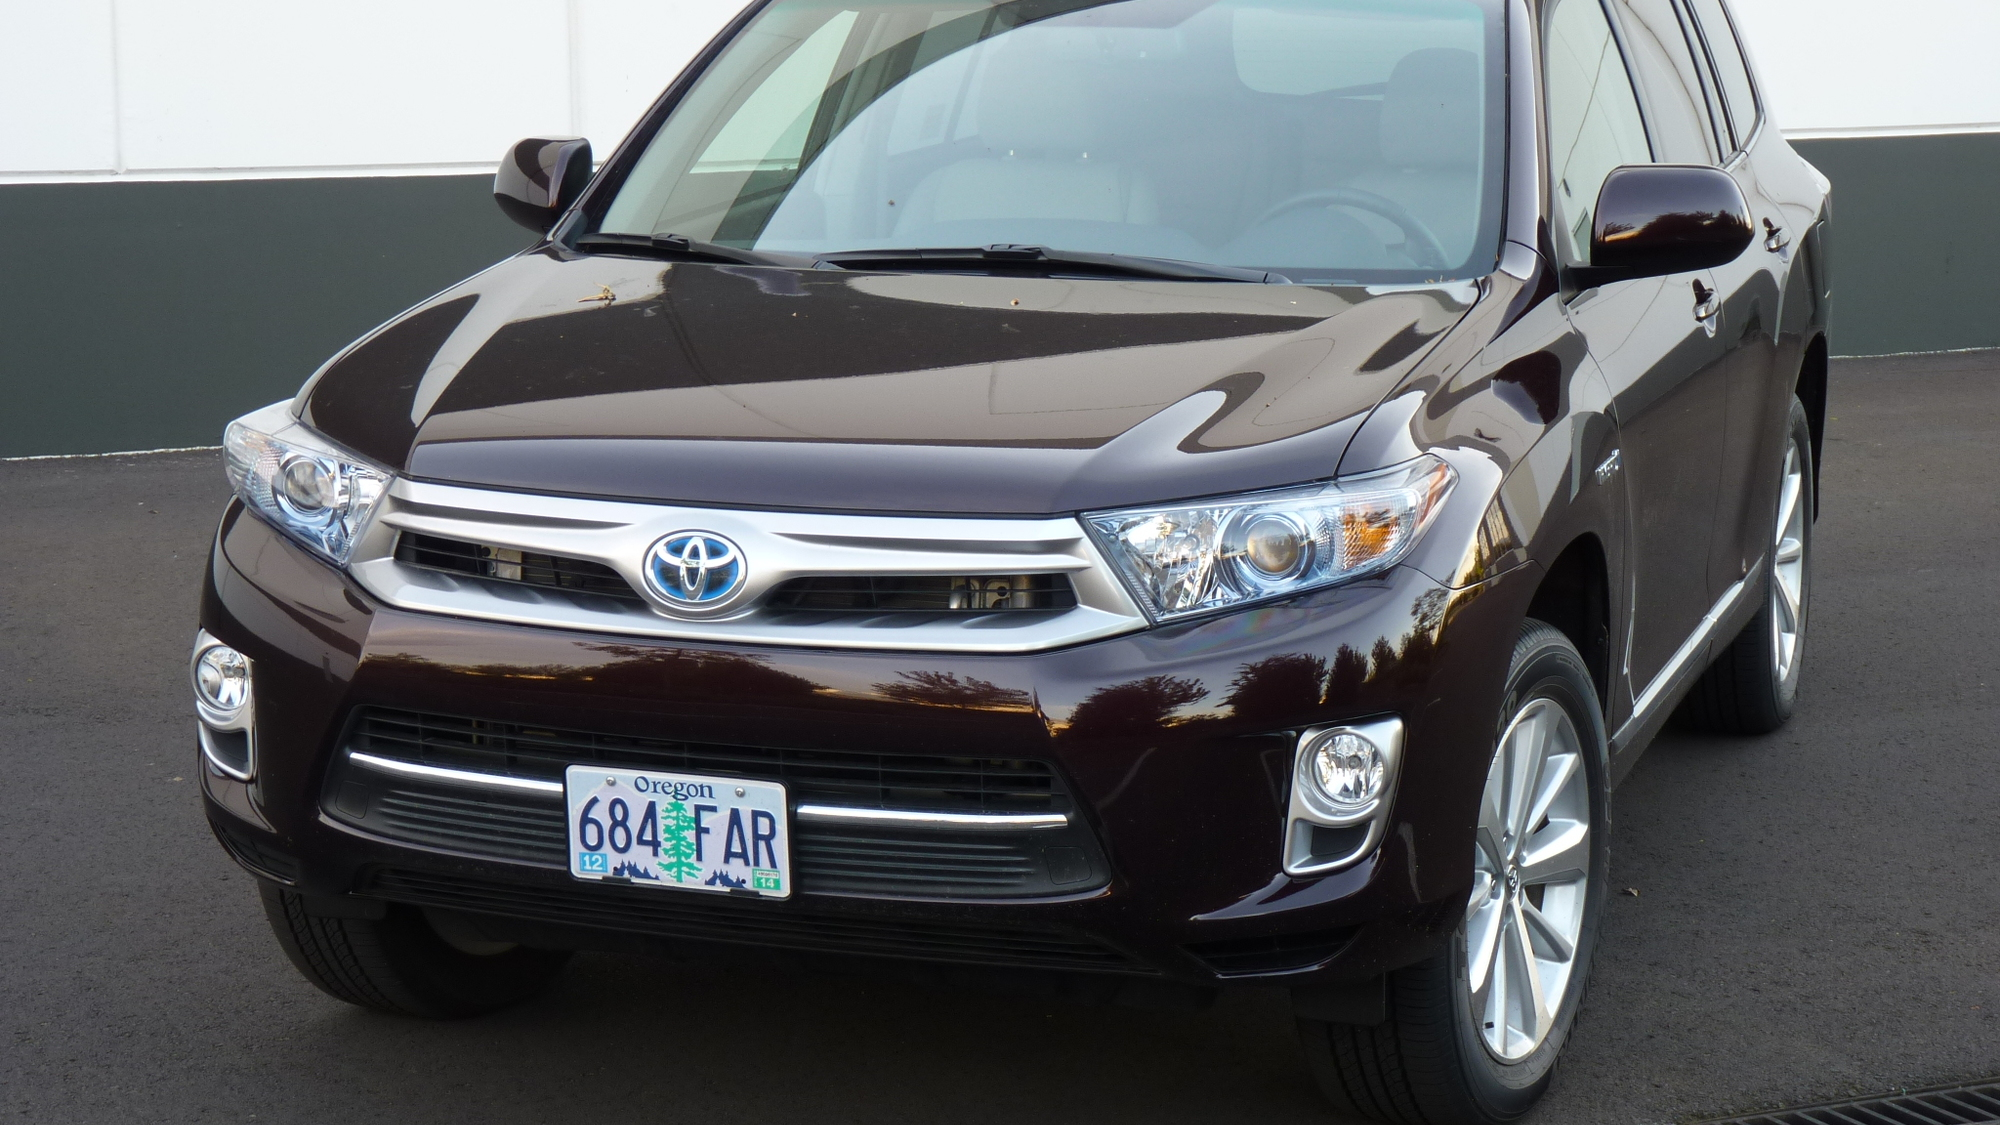 2012 Toyota Highlander Hybrid: Quick Drive, Highest MPG With